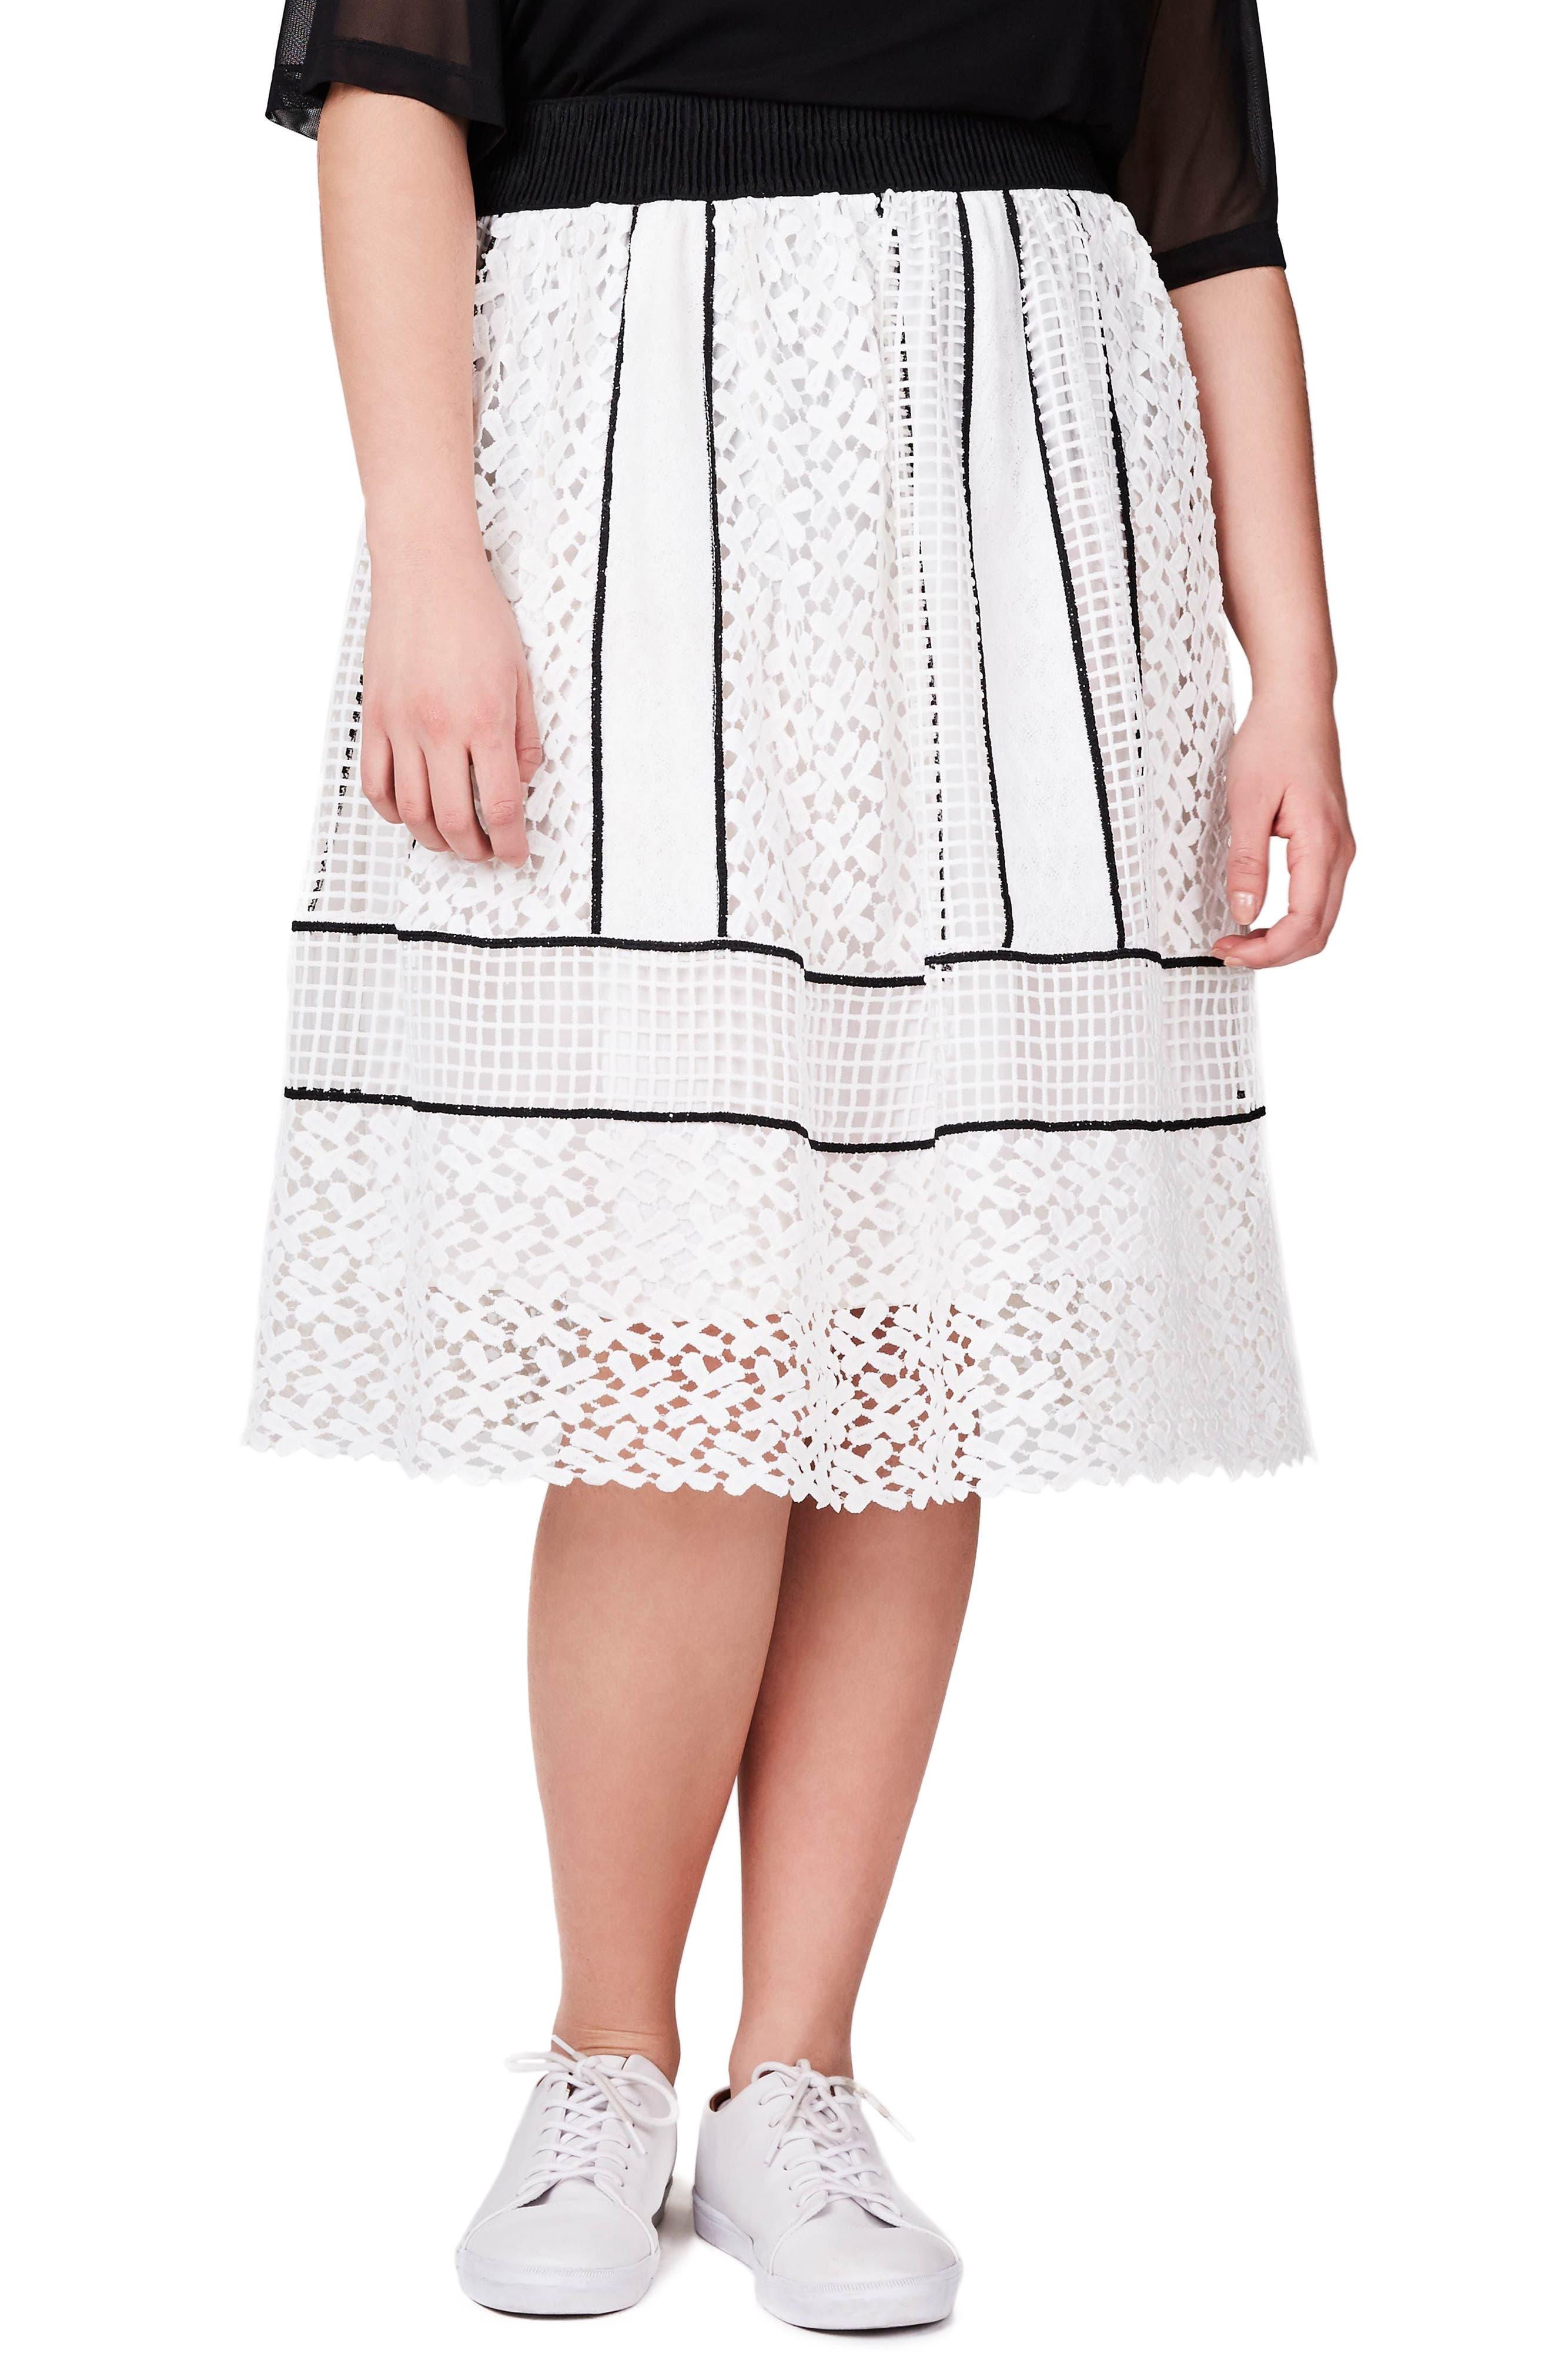 Alternate Image 1 Selected - ELVI Mixed Lace Skirt (Plus Size)